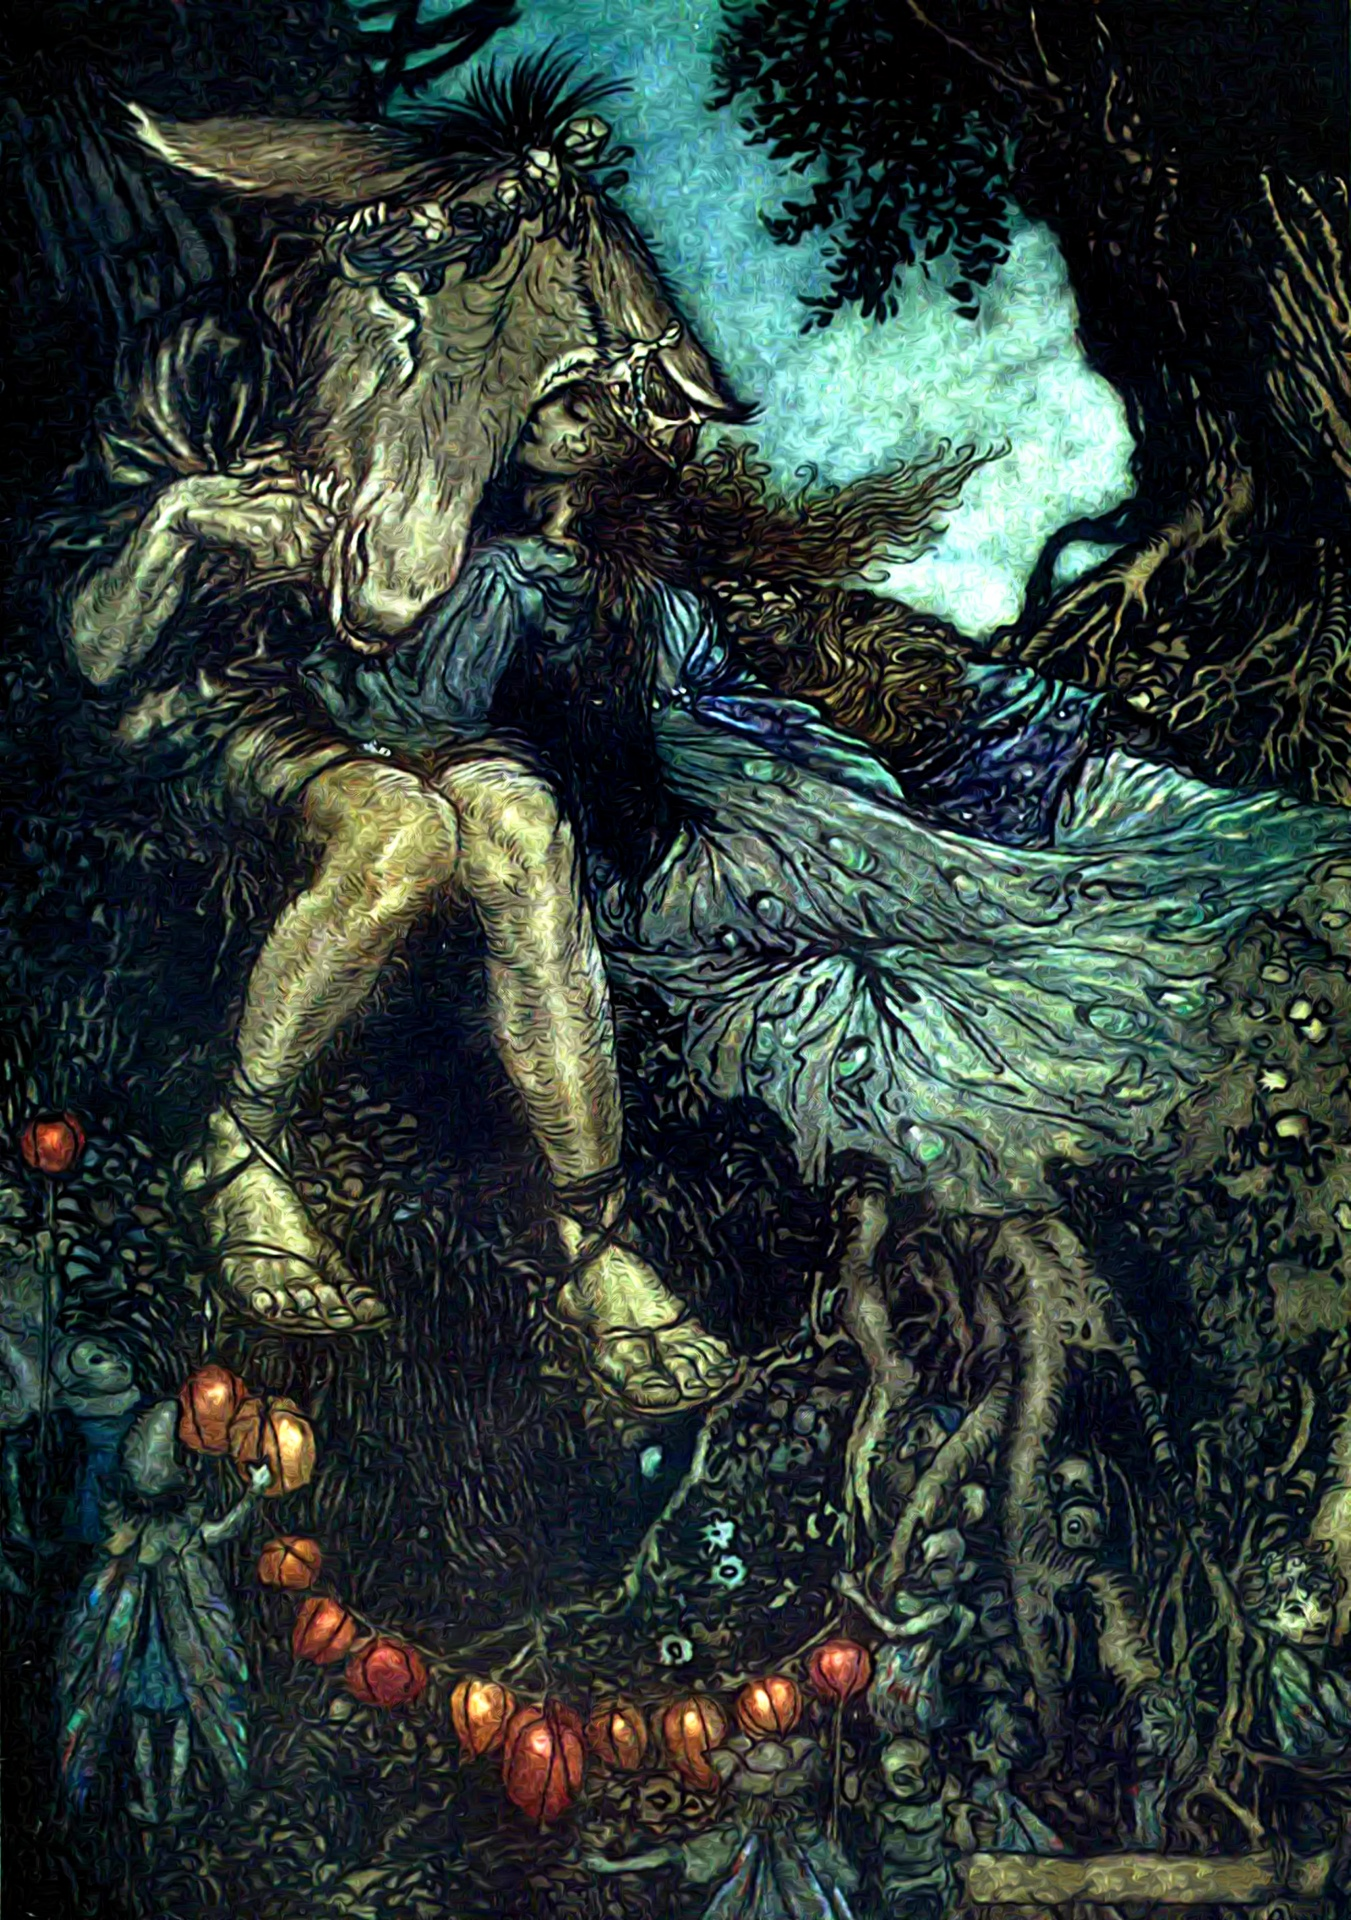 a-midsummer-nights-dream-1475849386SwU - Dawn Hudson - Public Domain Pictures